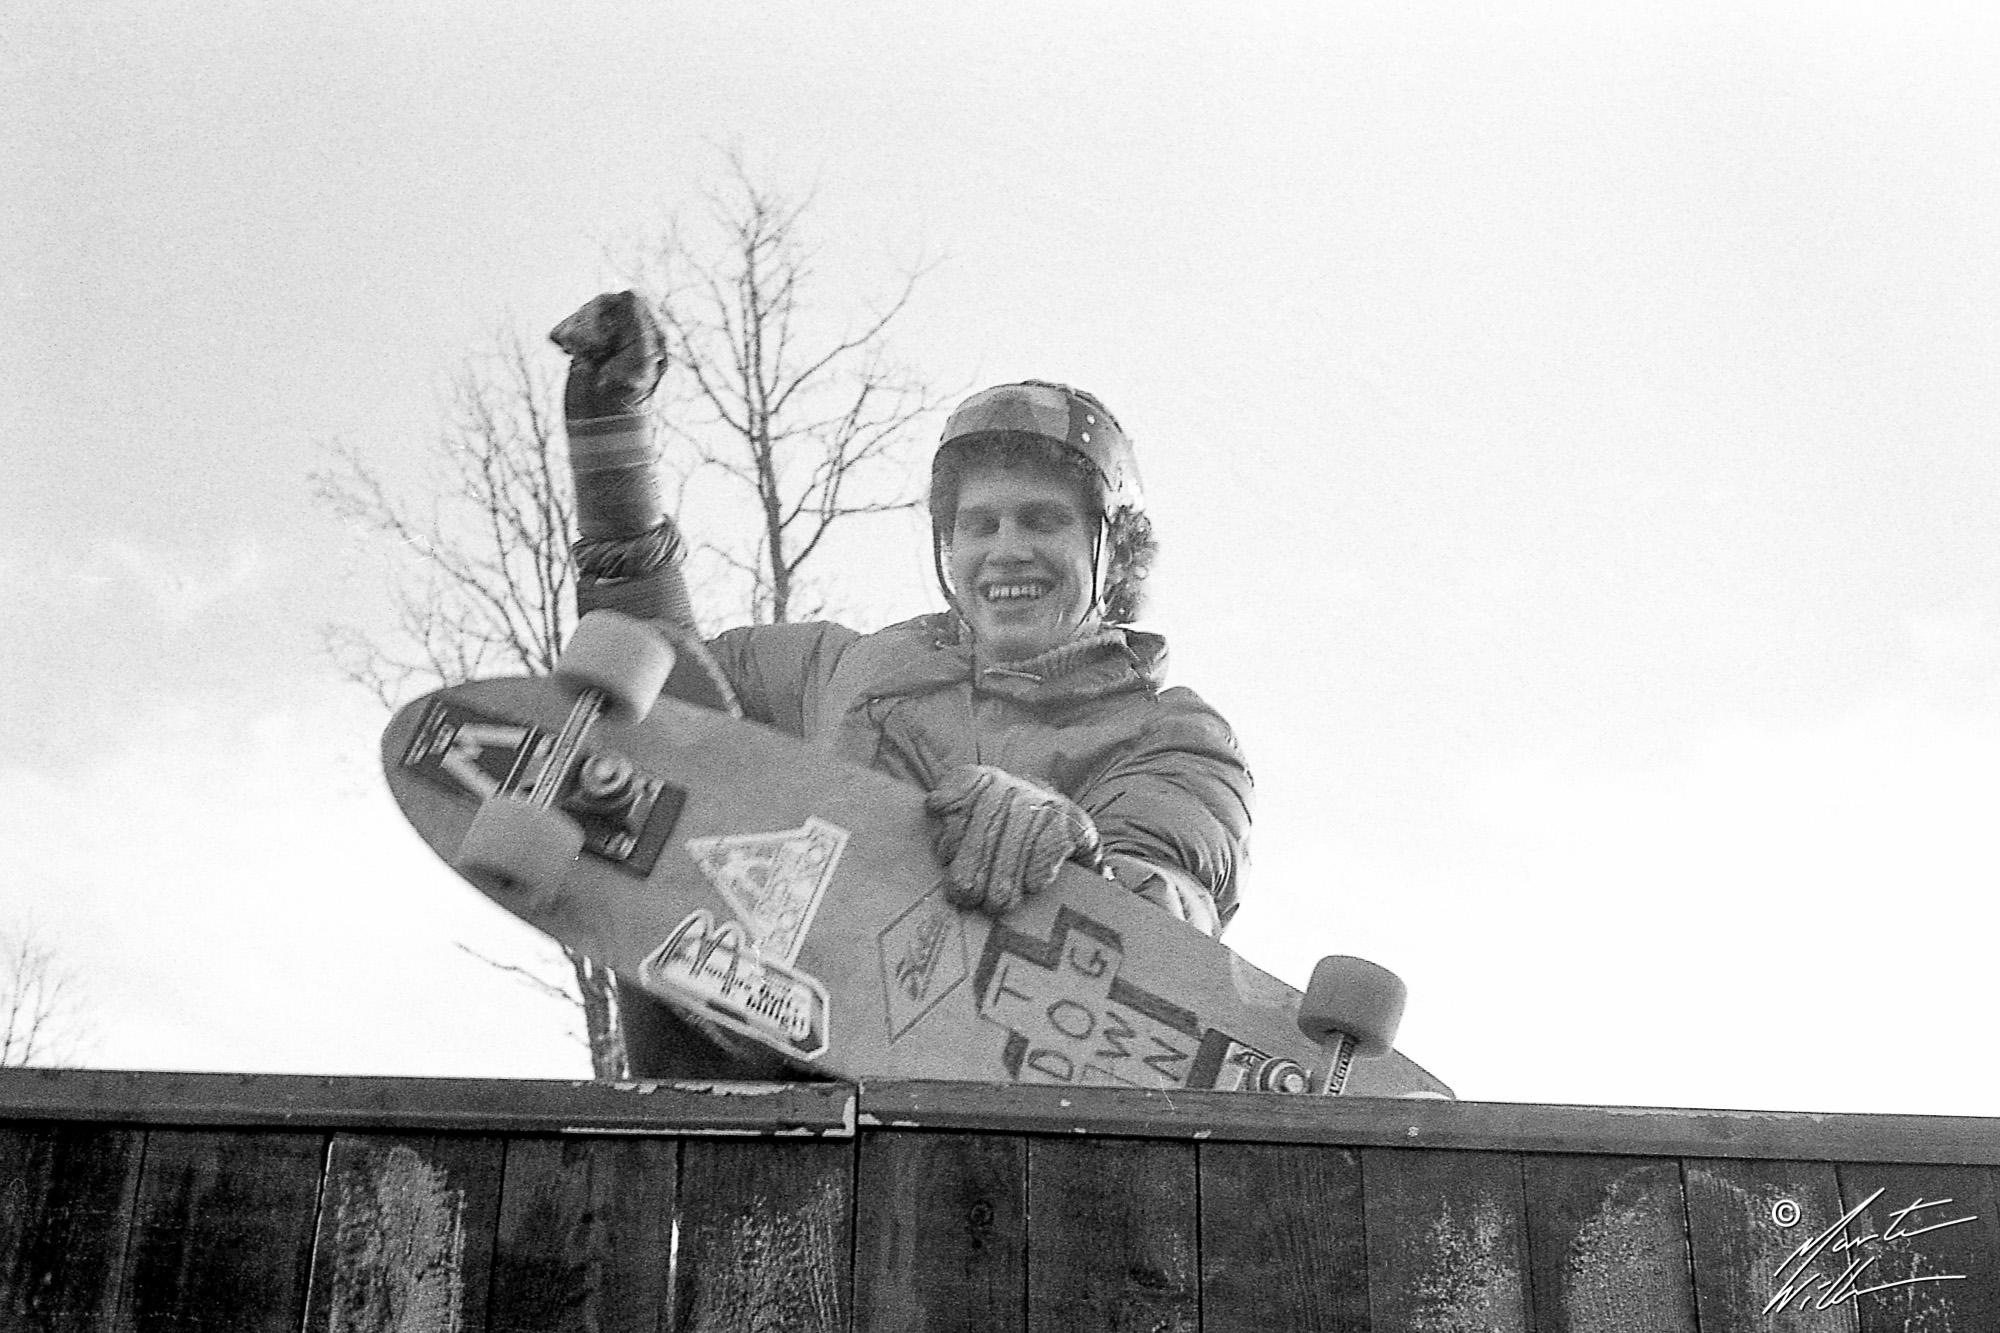 Philip Willners, 1-wheeler Jönköping, 1978